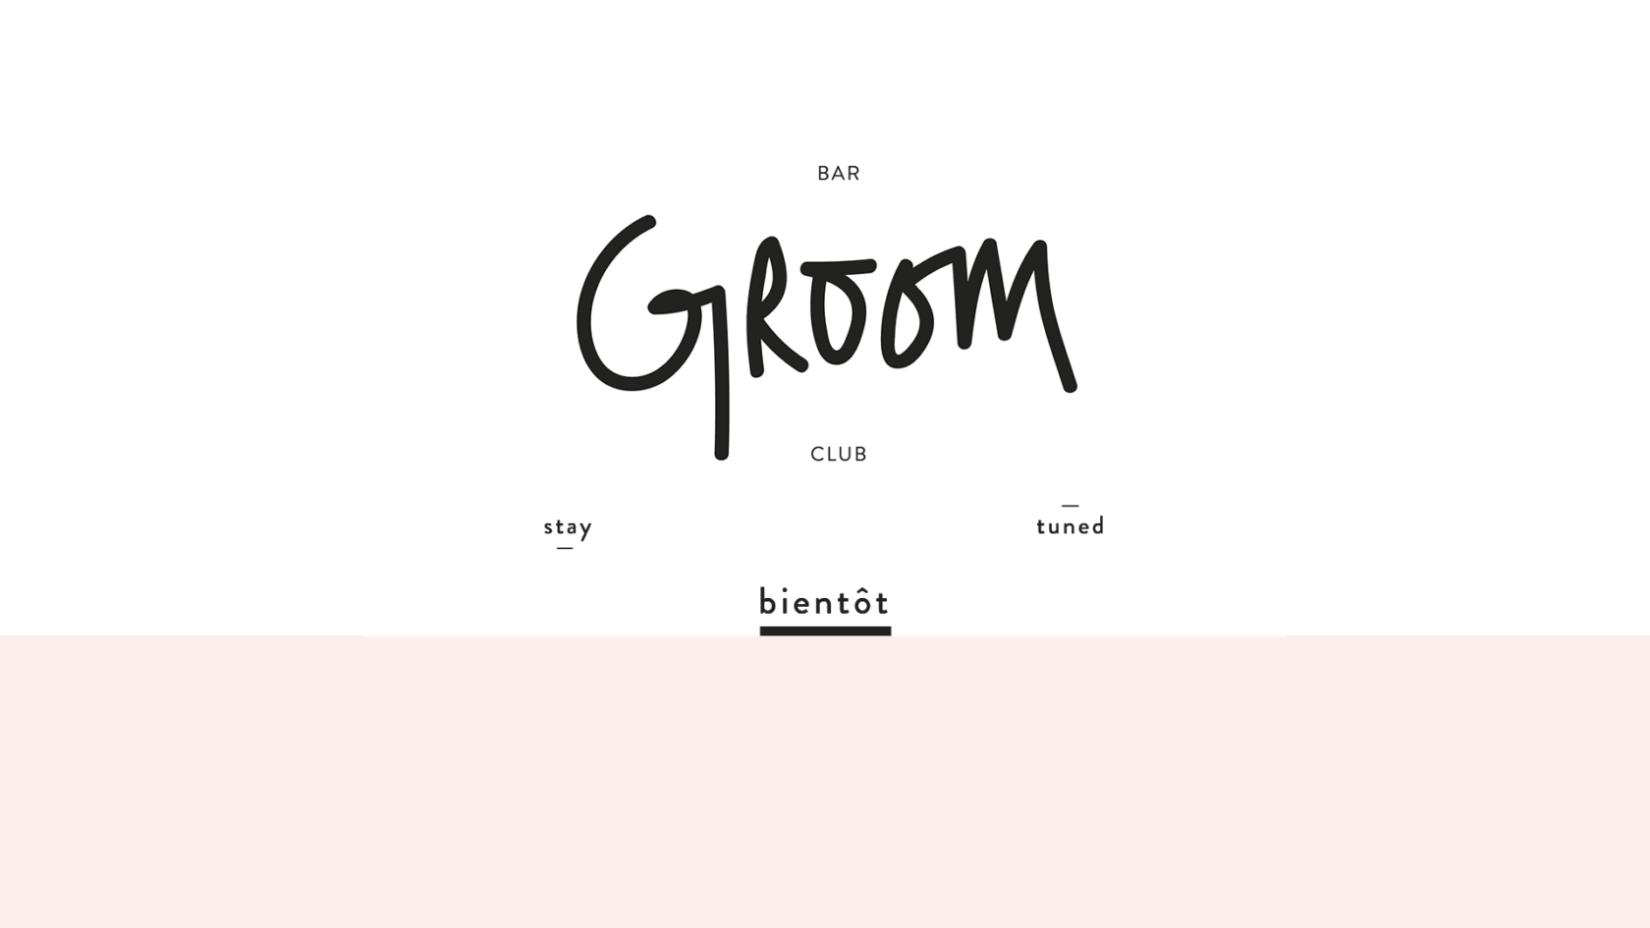 groom bar club lyon nouveau